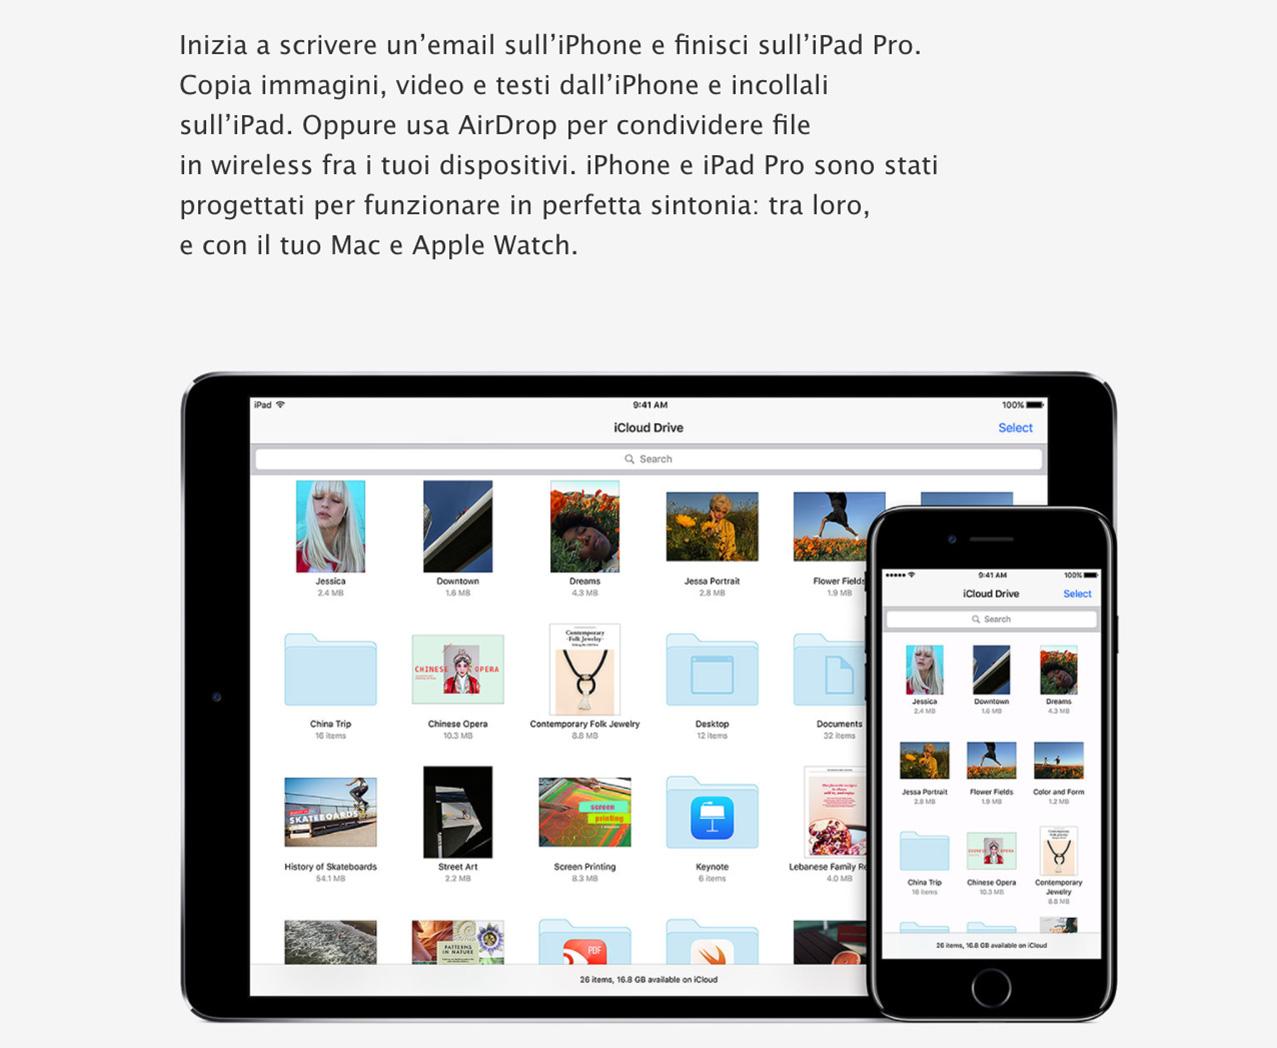 iPad Pro con iCloud drive